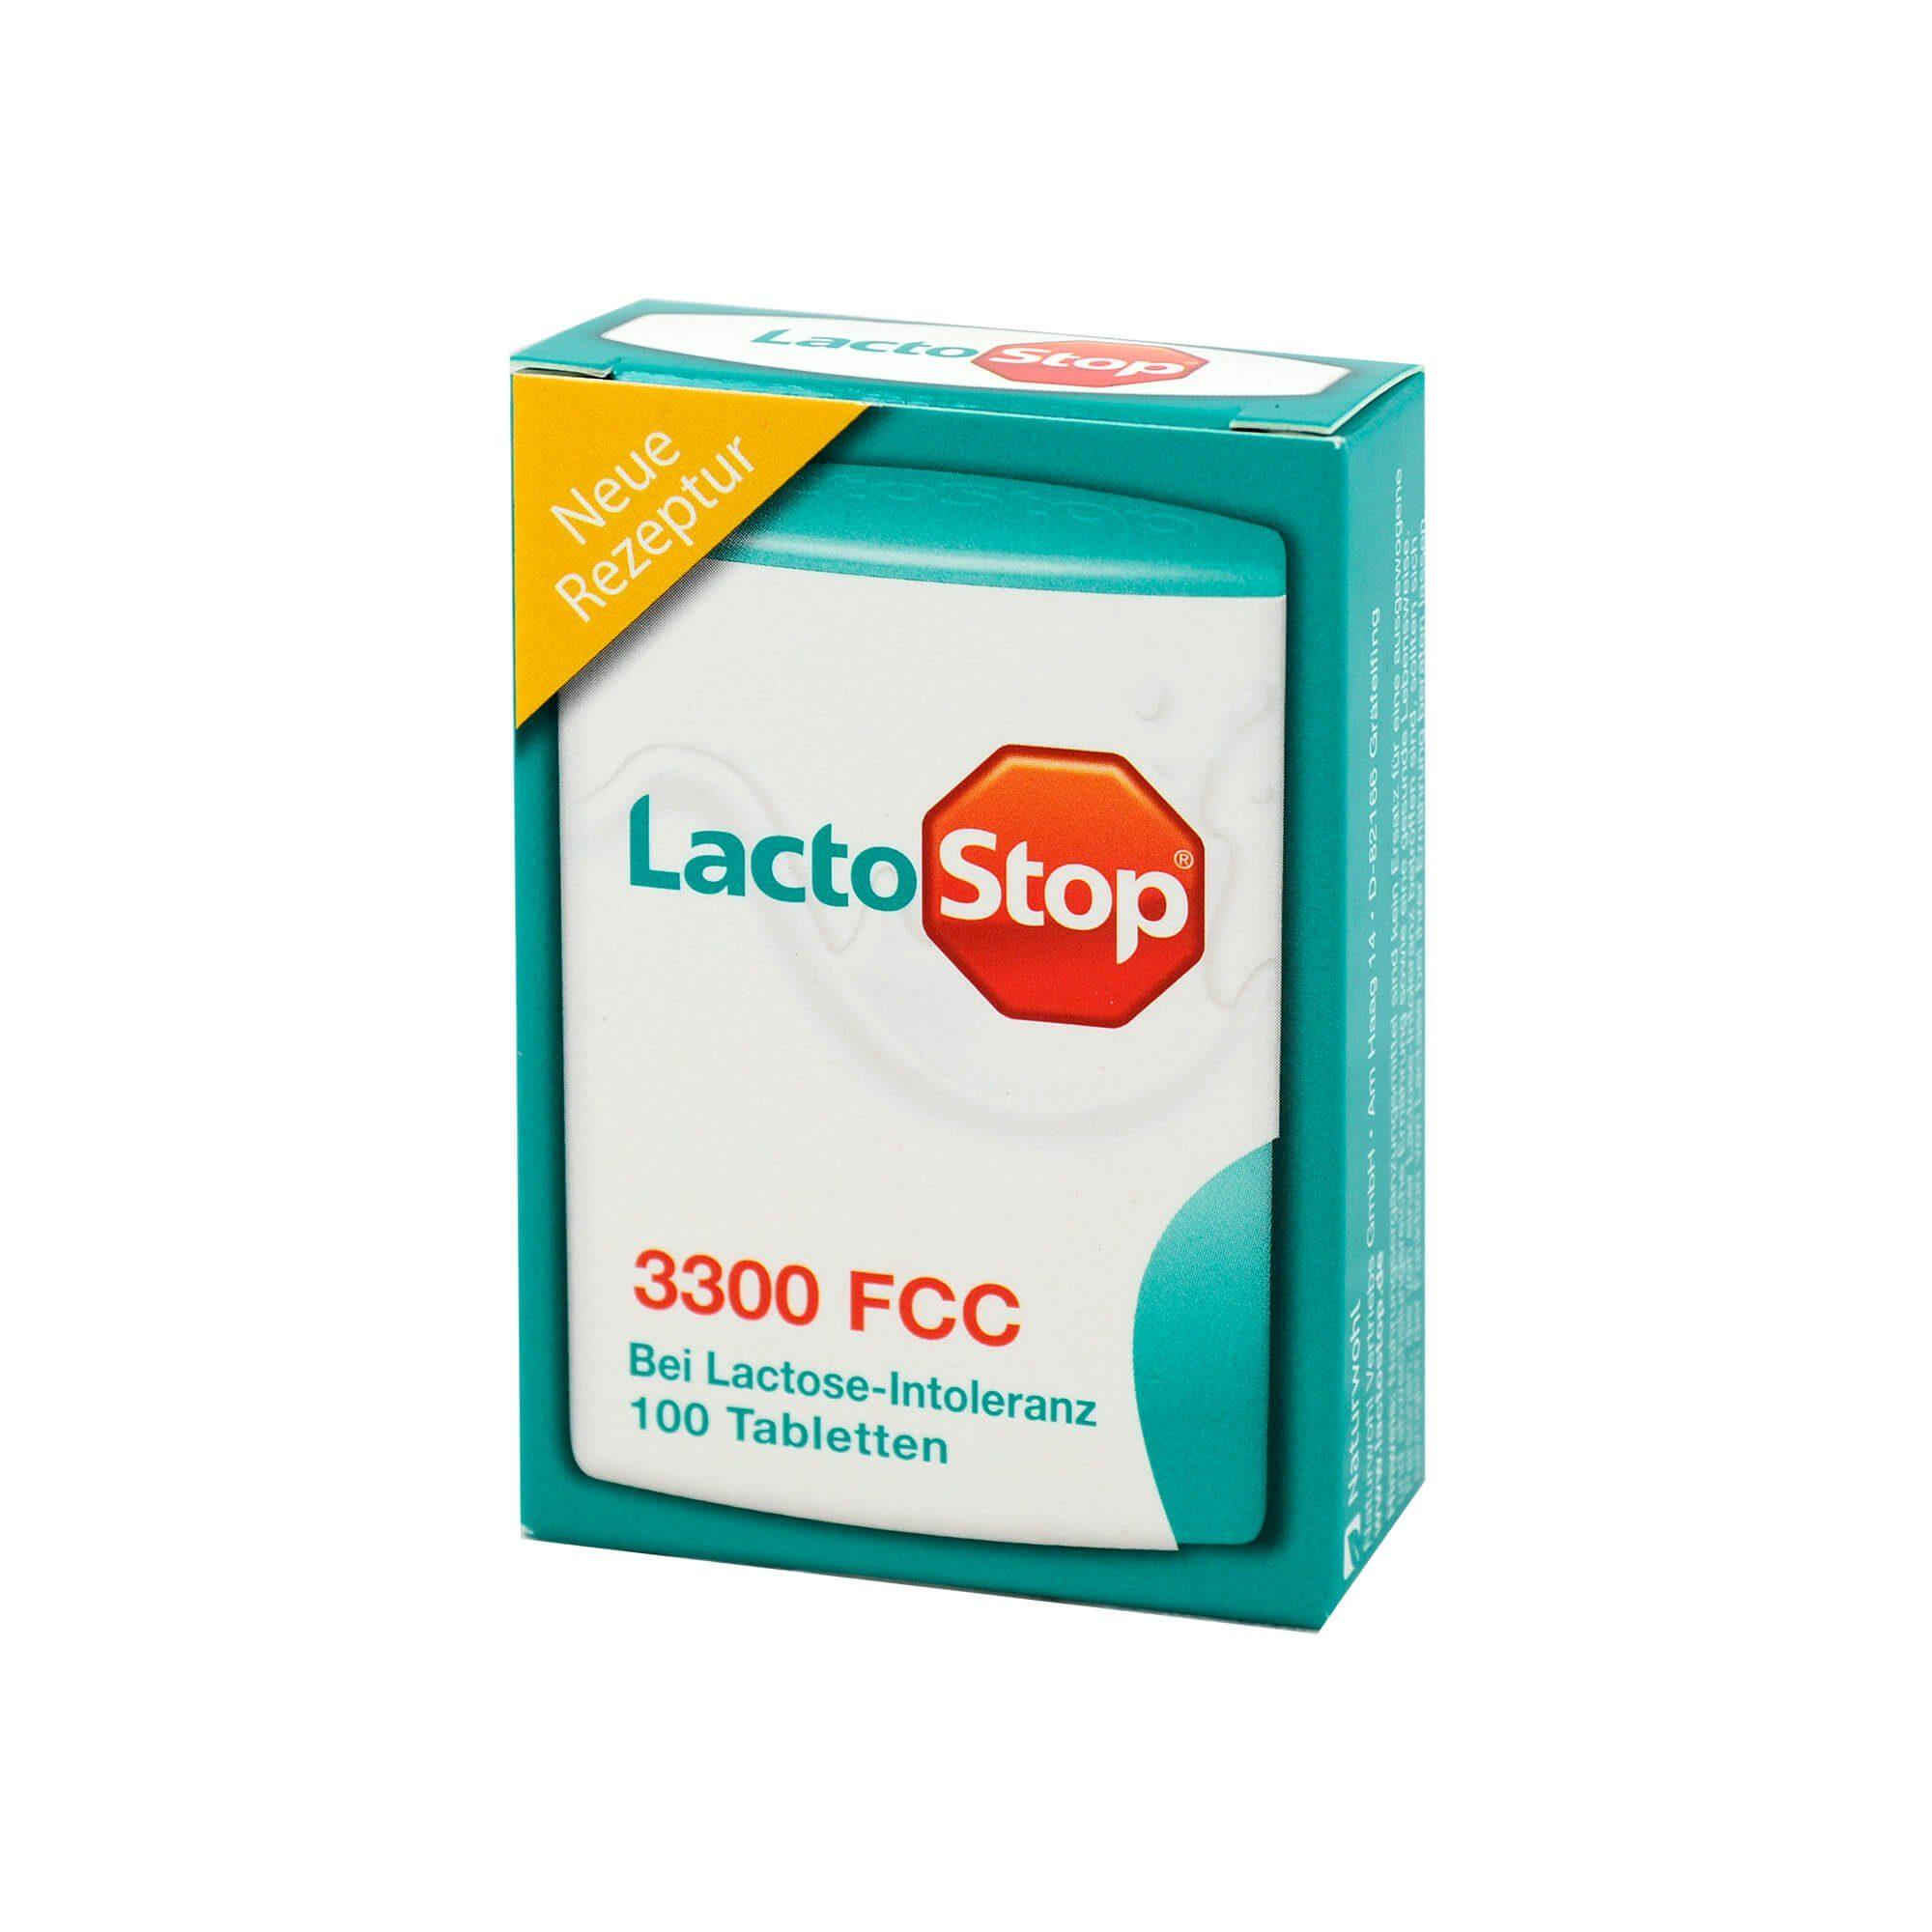 Lactostop 3300 FCC Klickspender, 100 St